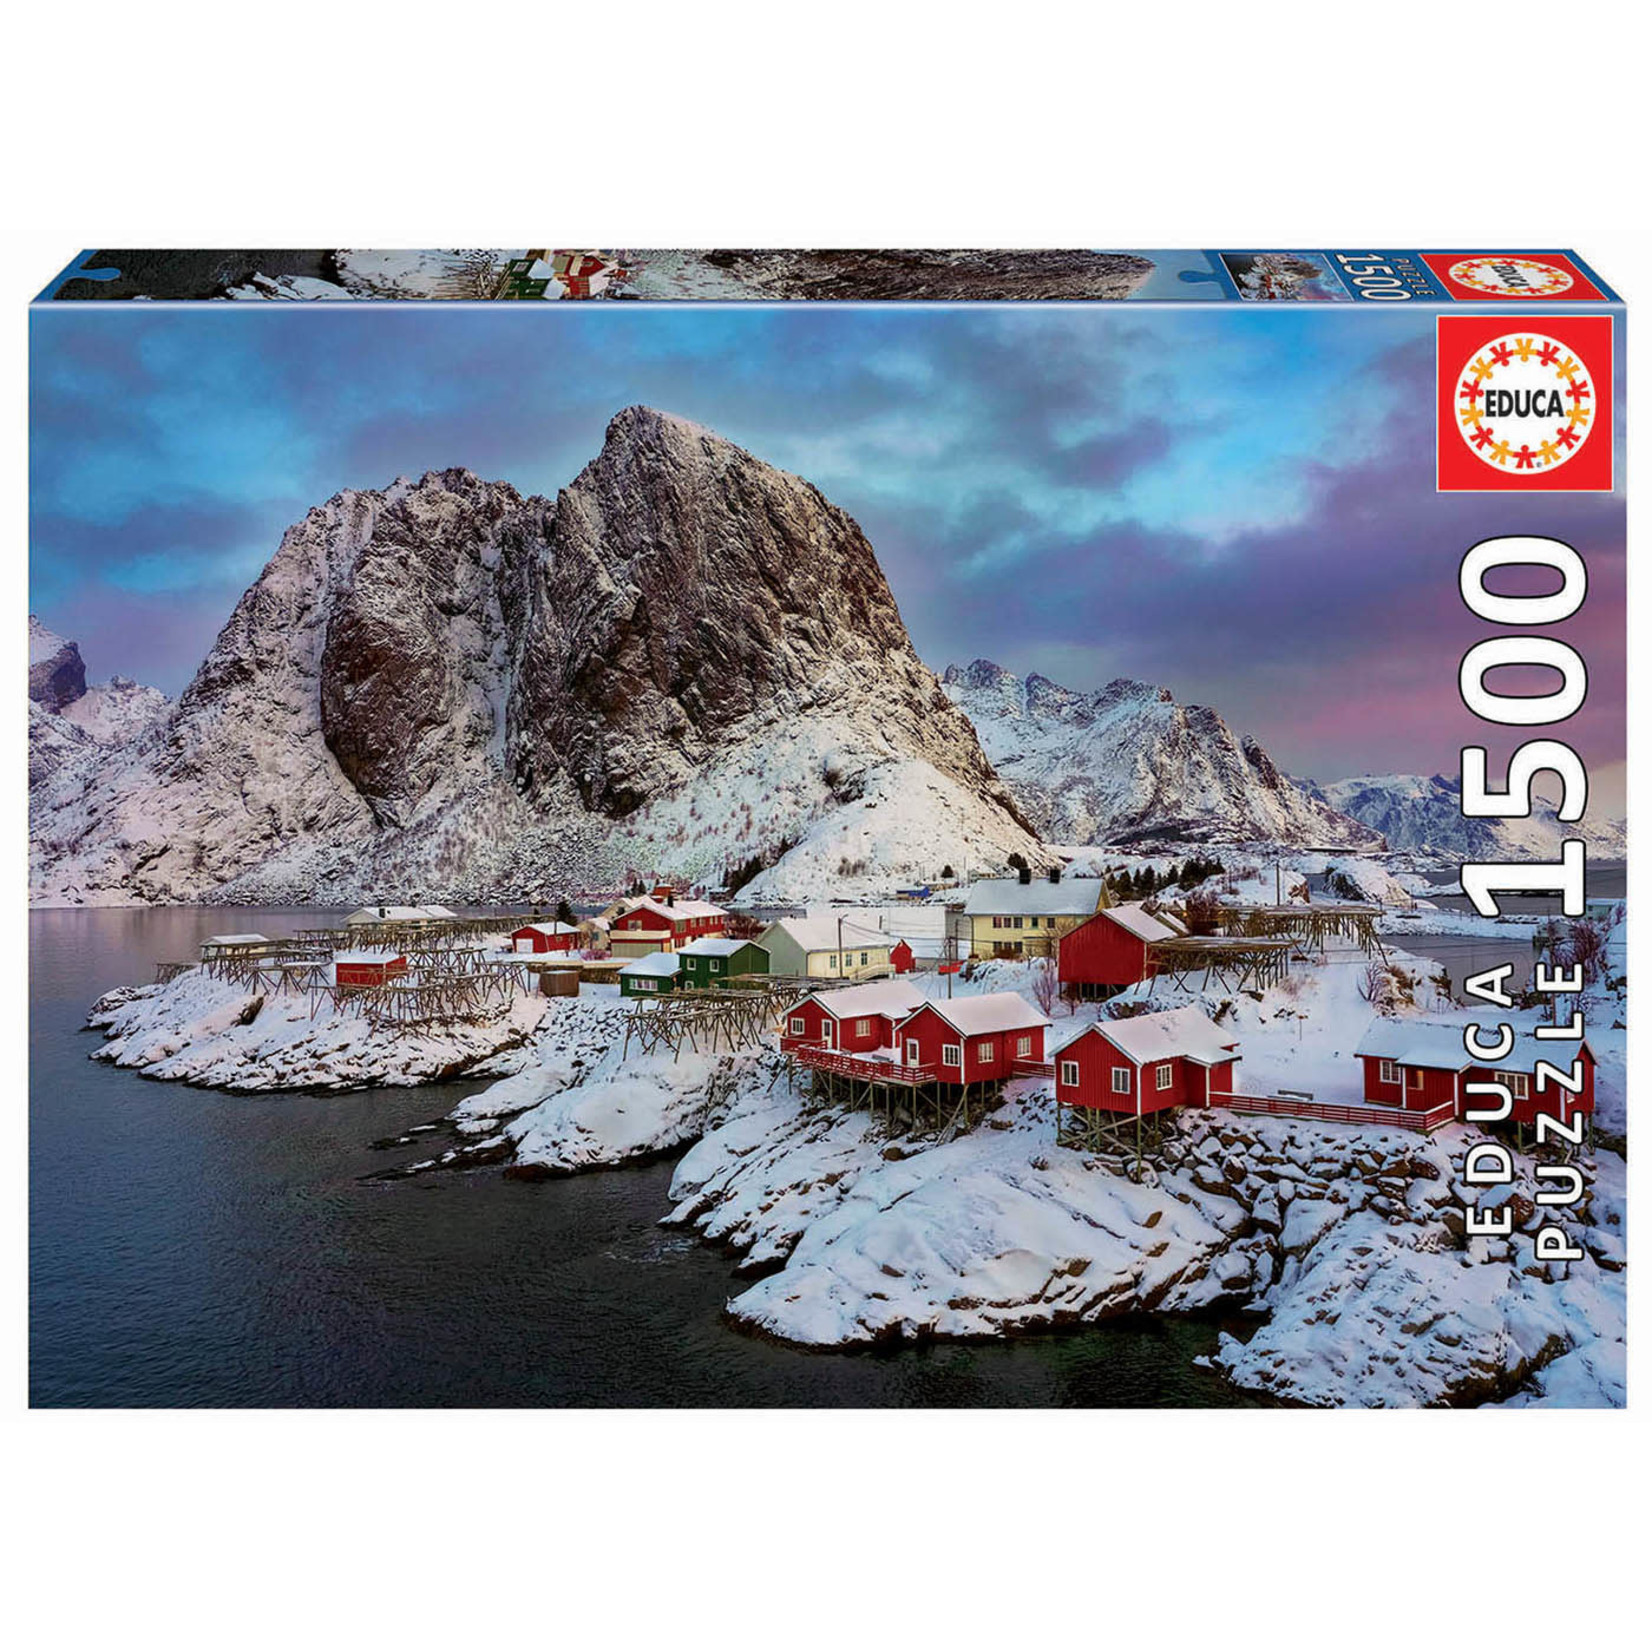 Educa Puzzles Lofoten Islands Norway 1500pc